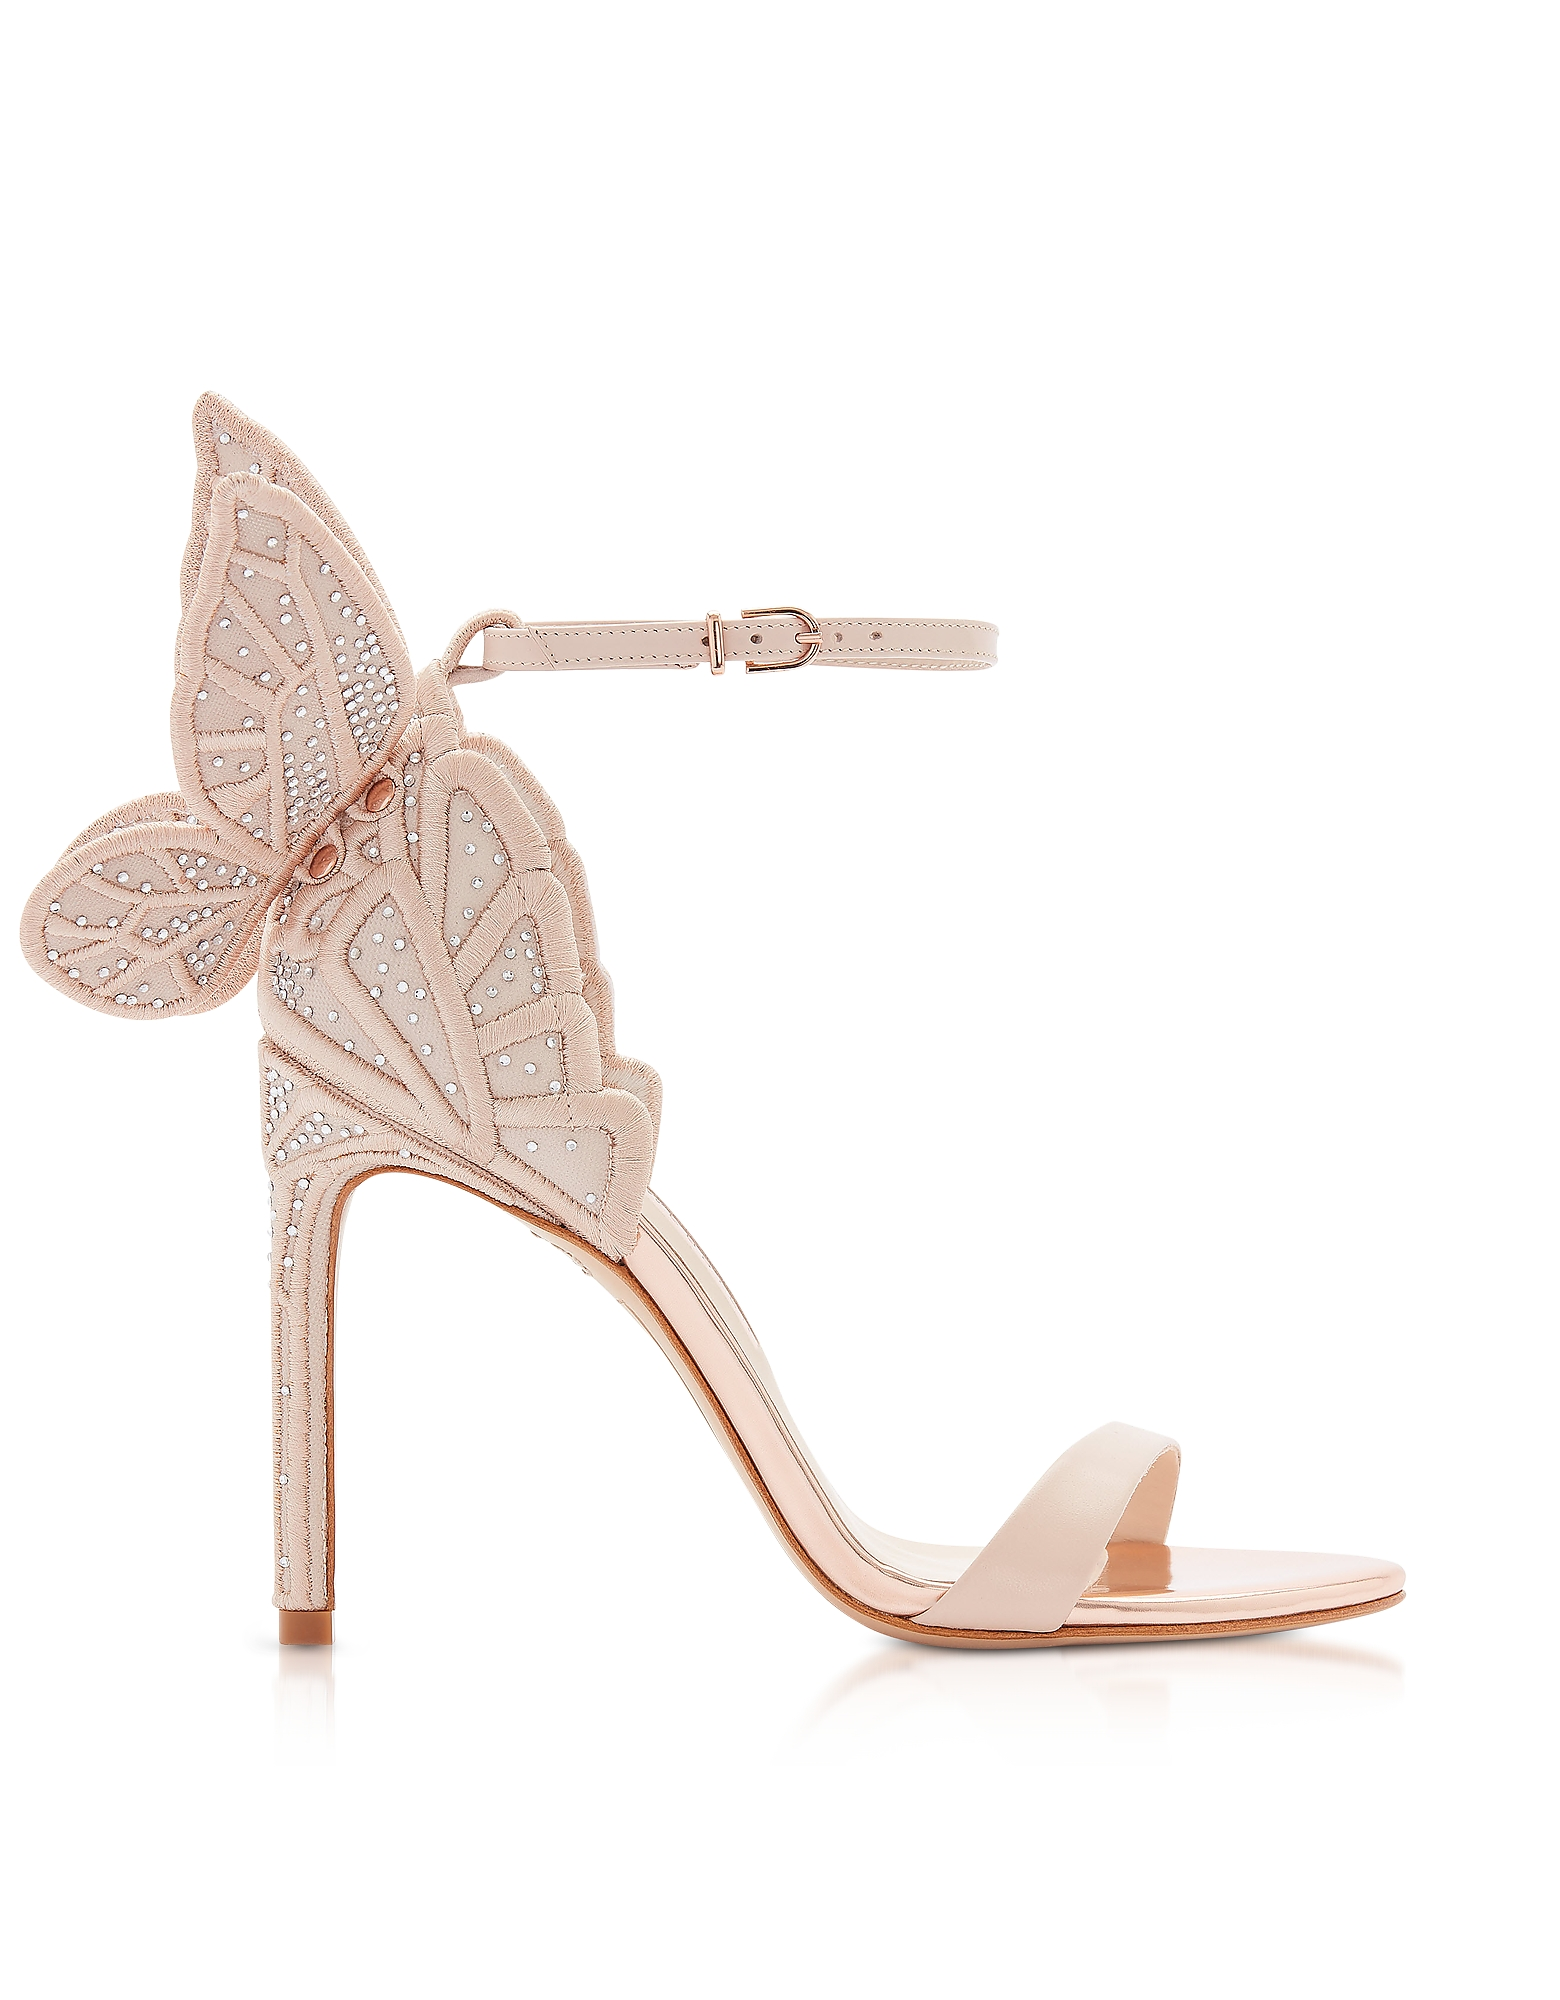 Dusty Chiara Embellished Sandals